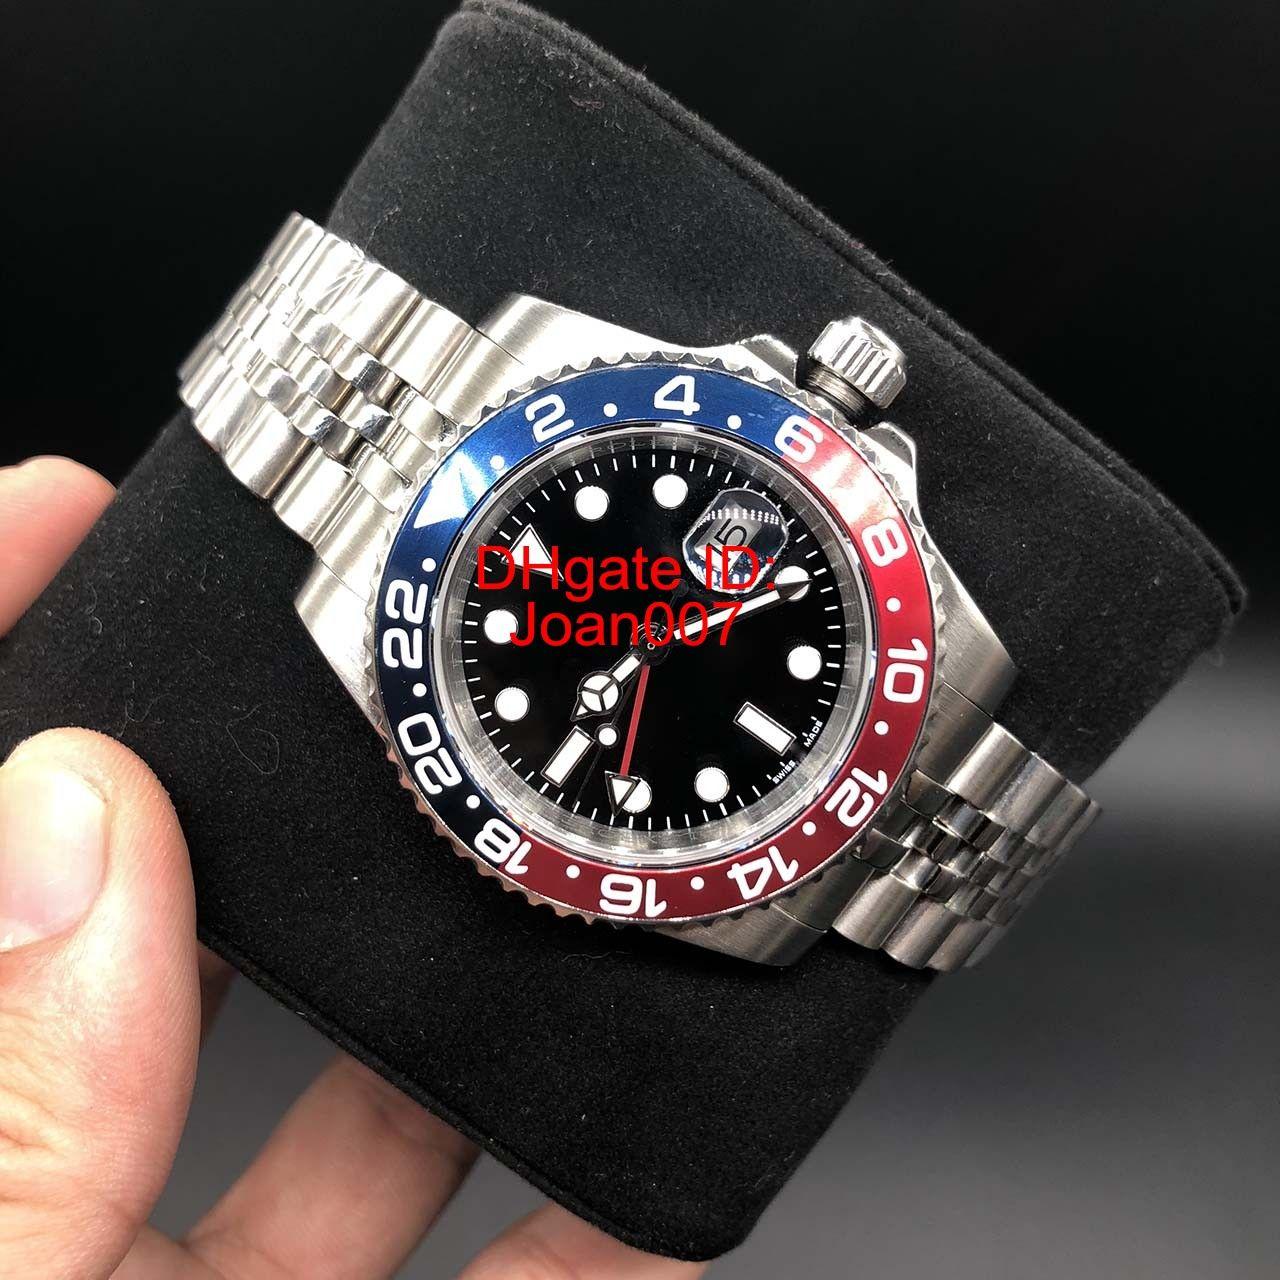 Großhandel 2018 Marke Uhren Saphirglas Wasserdichte Armbanduhren